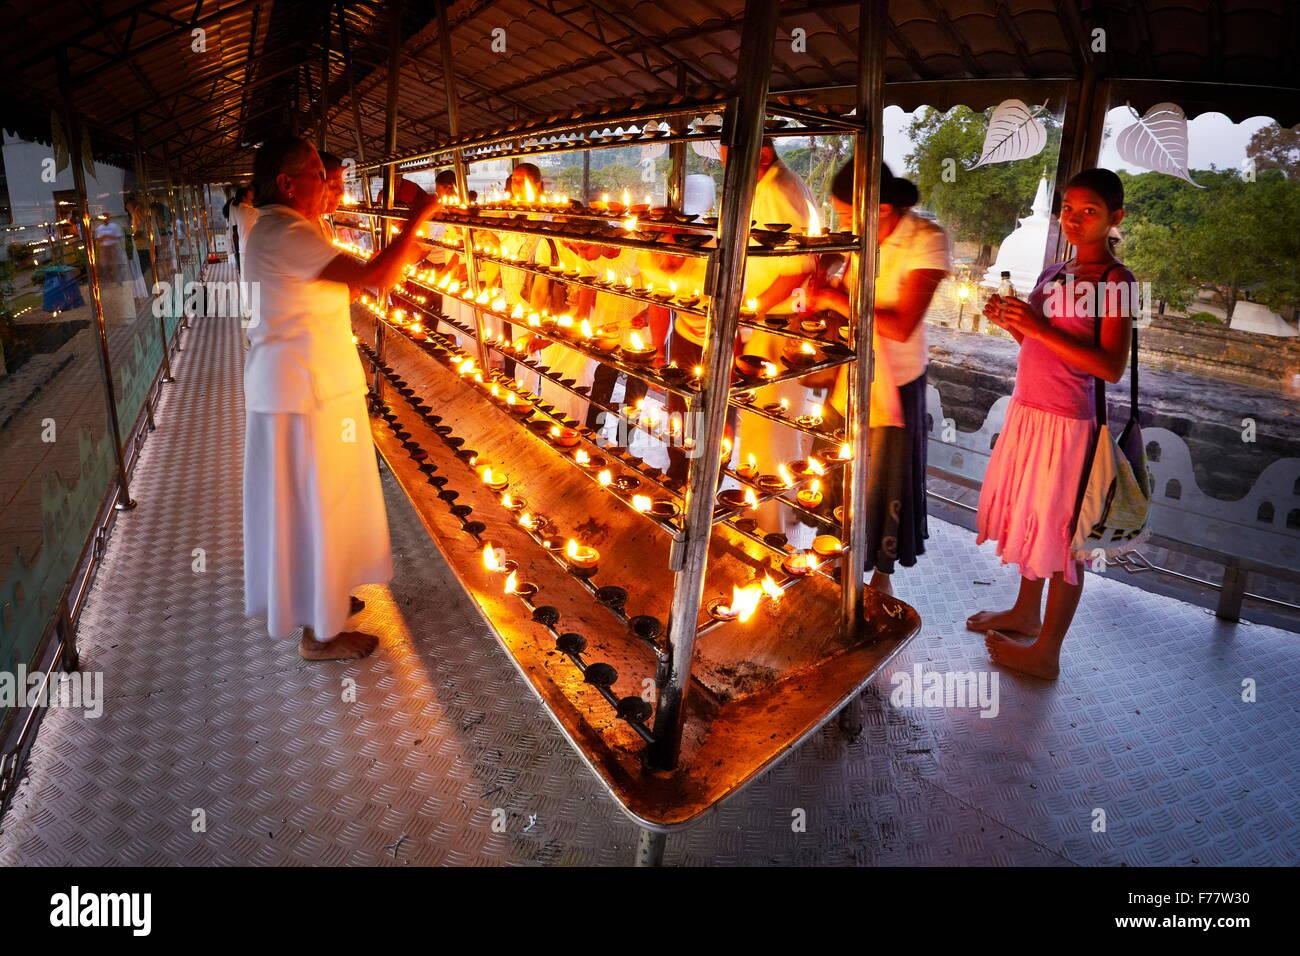 Sri Lanka, Kandy -  pilgrims light up candles in the Temple of the Tooth, Sri Dalada Maligawa, UNESCO World Heritage Site Stock Photo